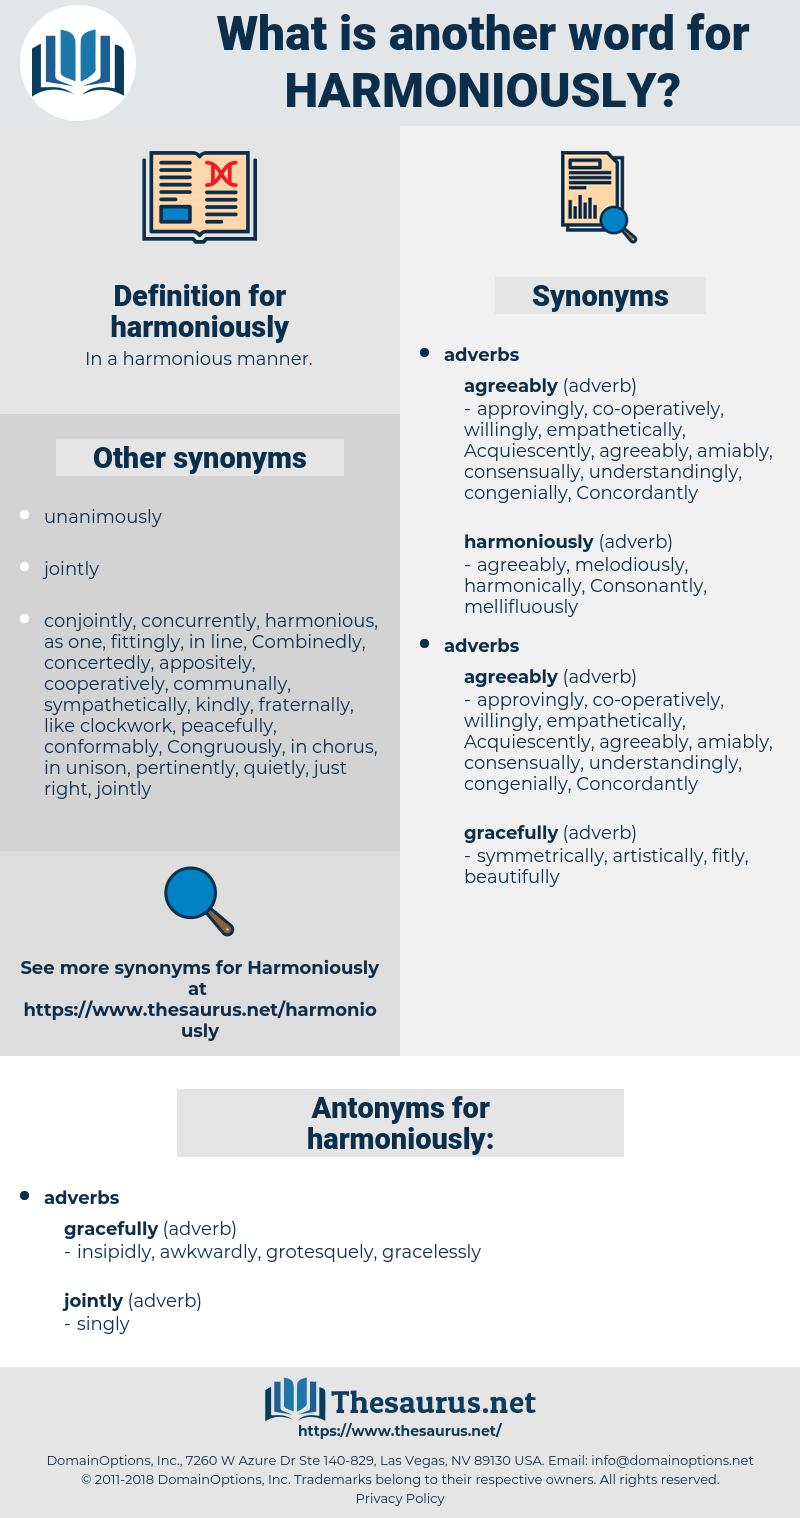 harmoniously, synonym harmoniously, another word for harmoniously, words like harmoniously, thesaurus harmoniously